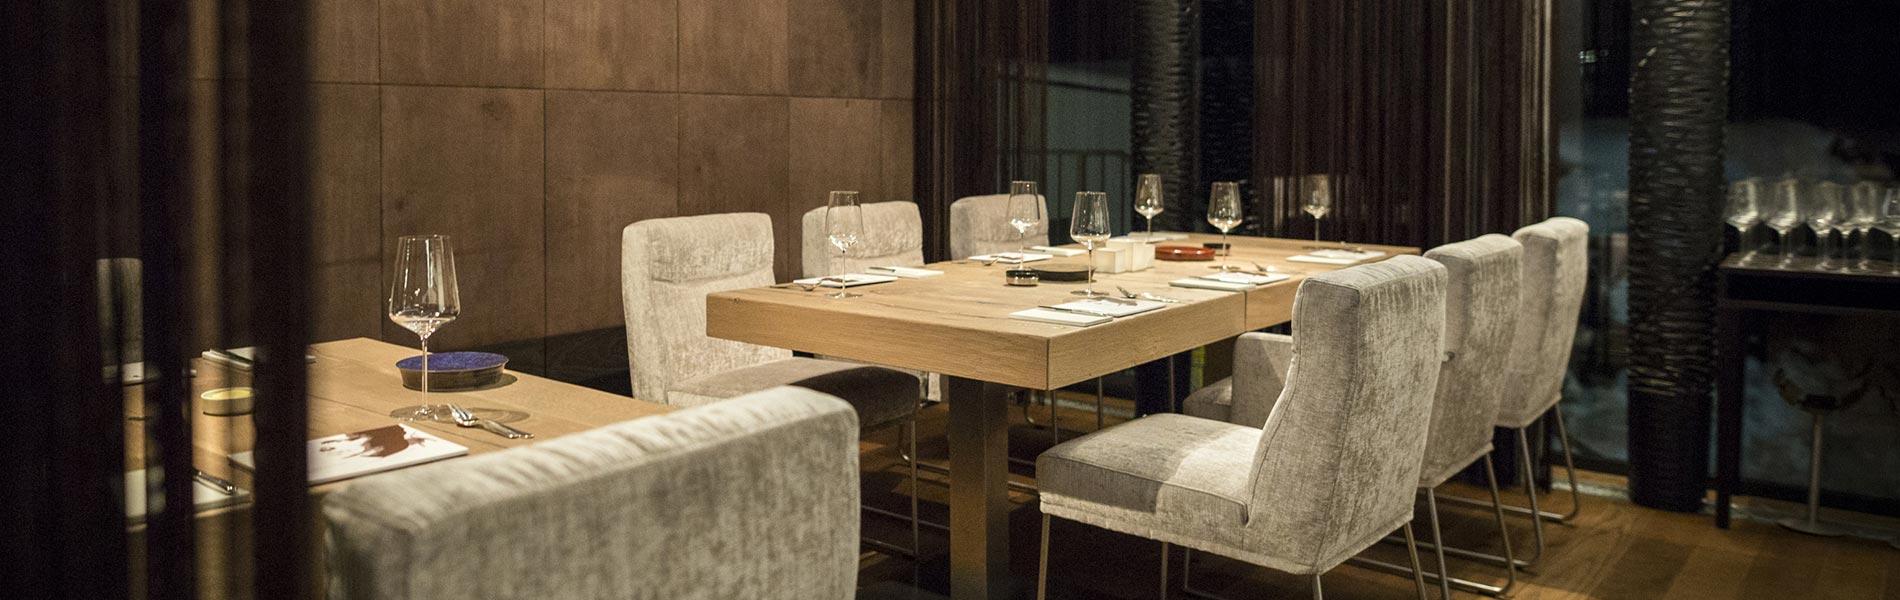 Rosengarten Events 5-Sterne Relais & Châteaux Luxushotel Gourmetrestaurant Hotel Restaurant Spa Rosengarten